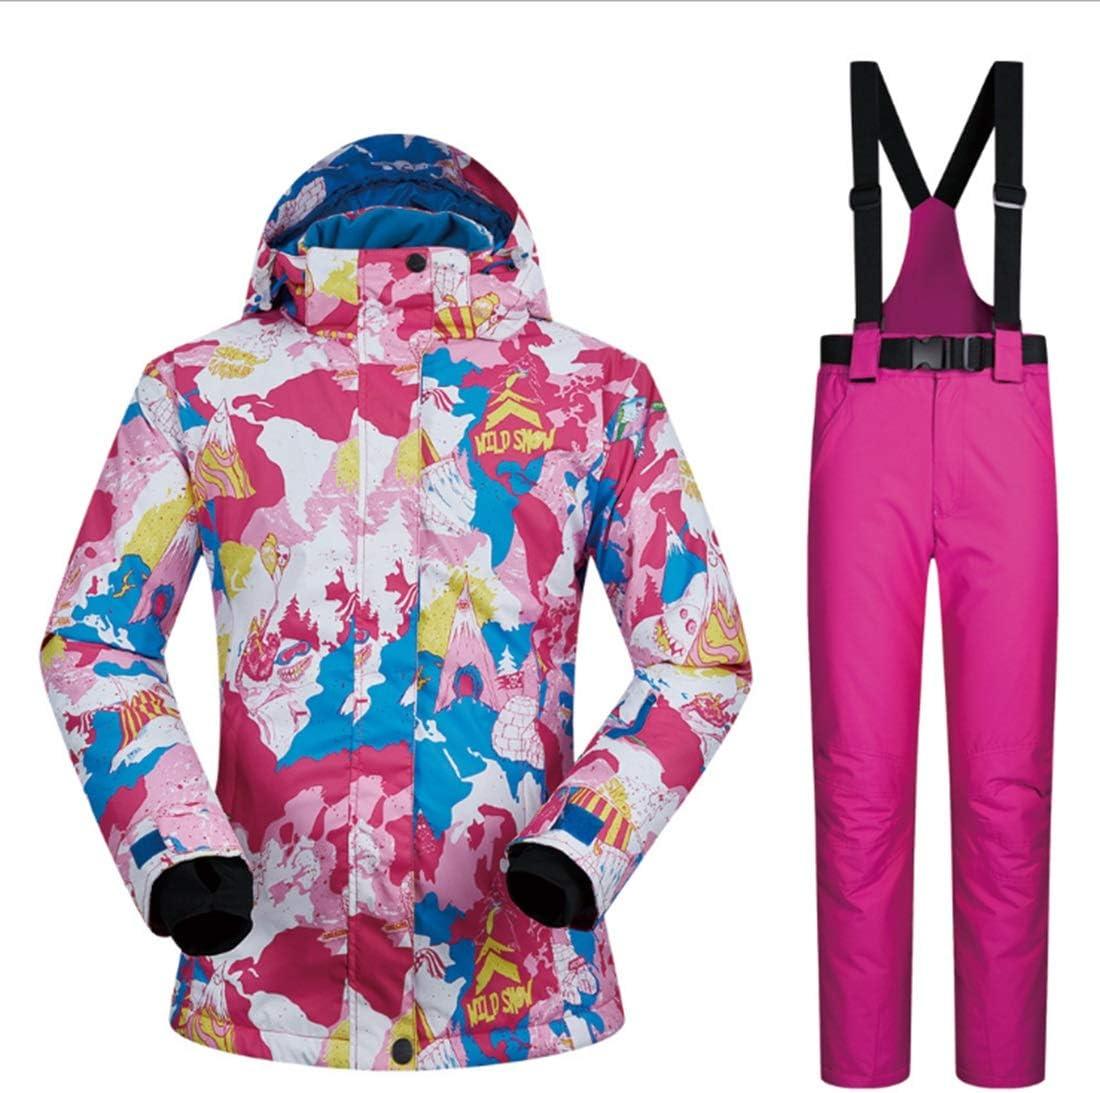 YXDIANZI 女性のジャケット冬の女の子コート屋外スポーツドレススキージャケットの下ゼロコート(S-XL) (色 : 05, サイズ : XL)  X-Large